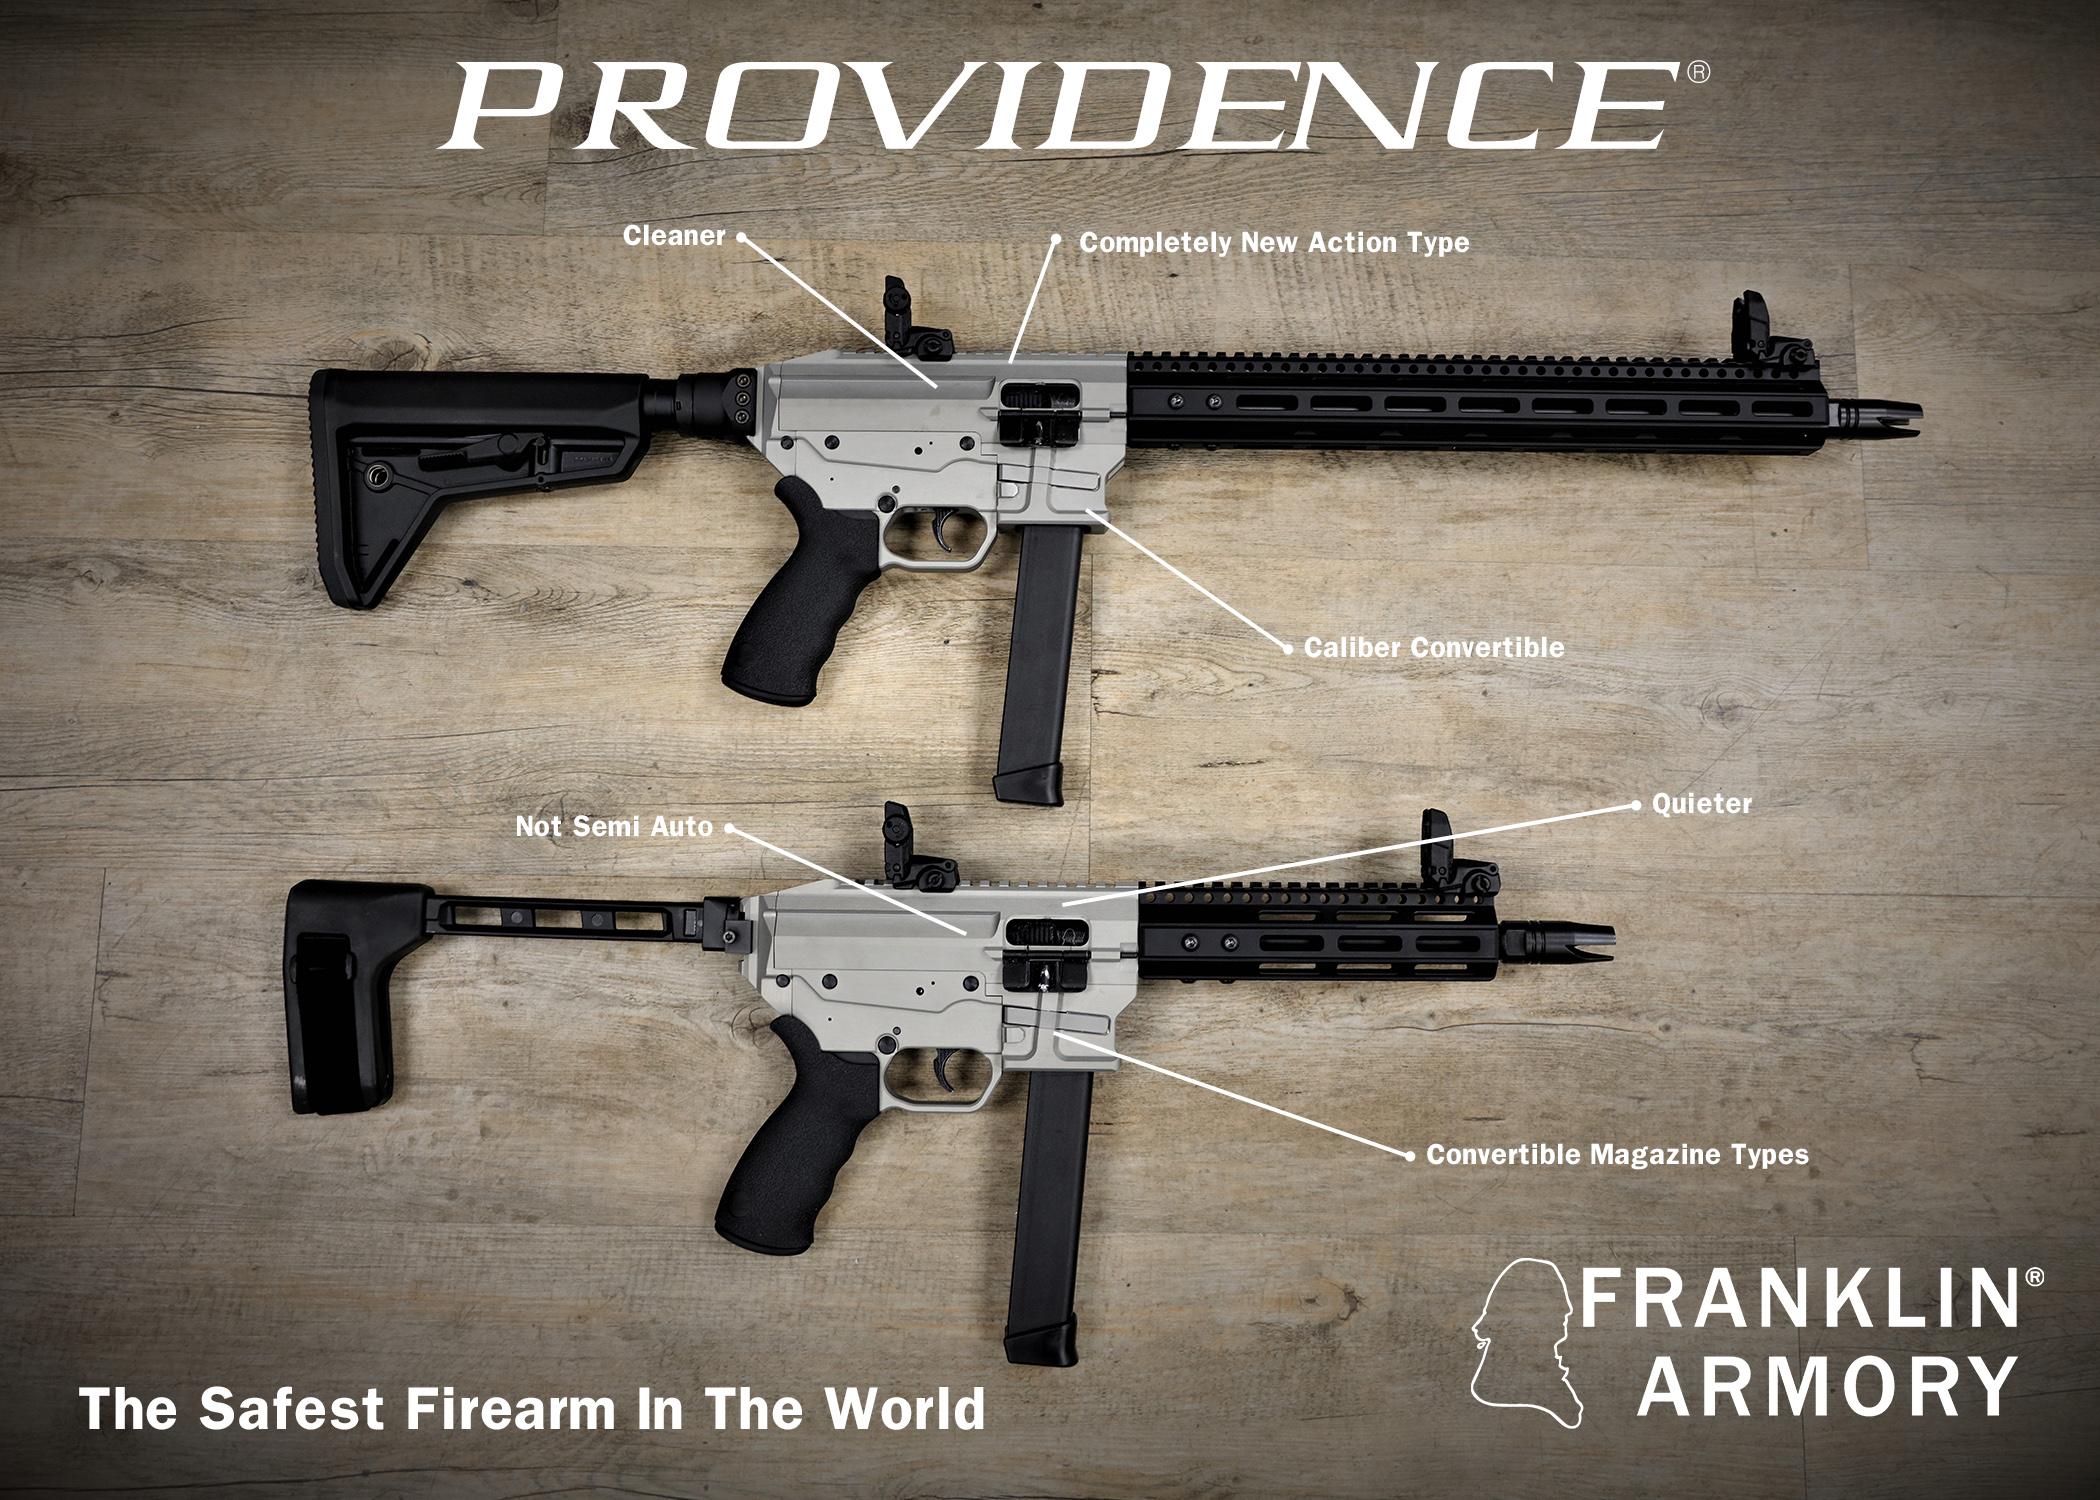 providence-pres-release-phot.jpg